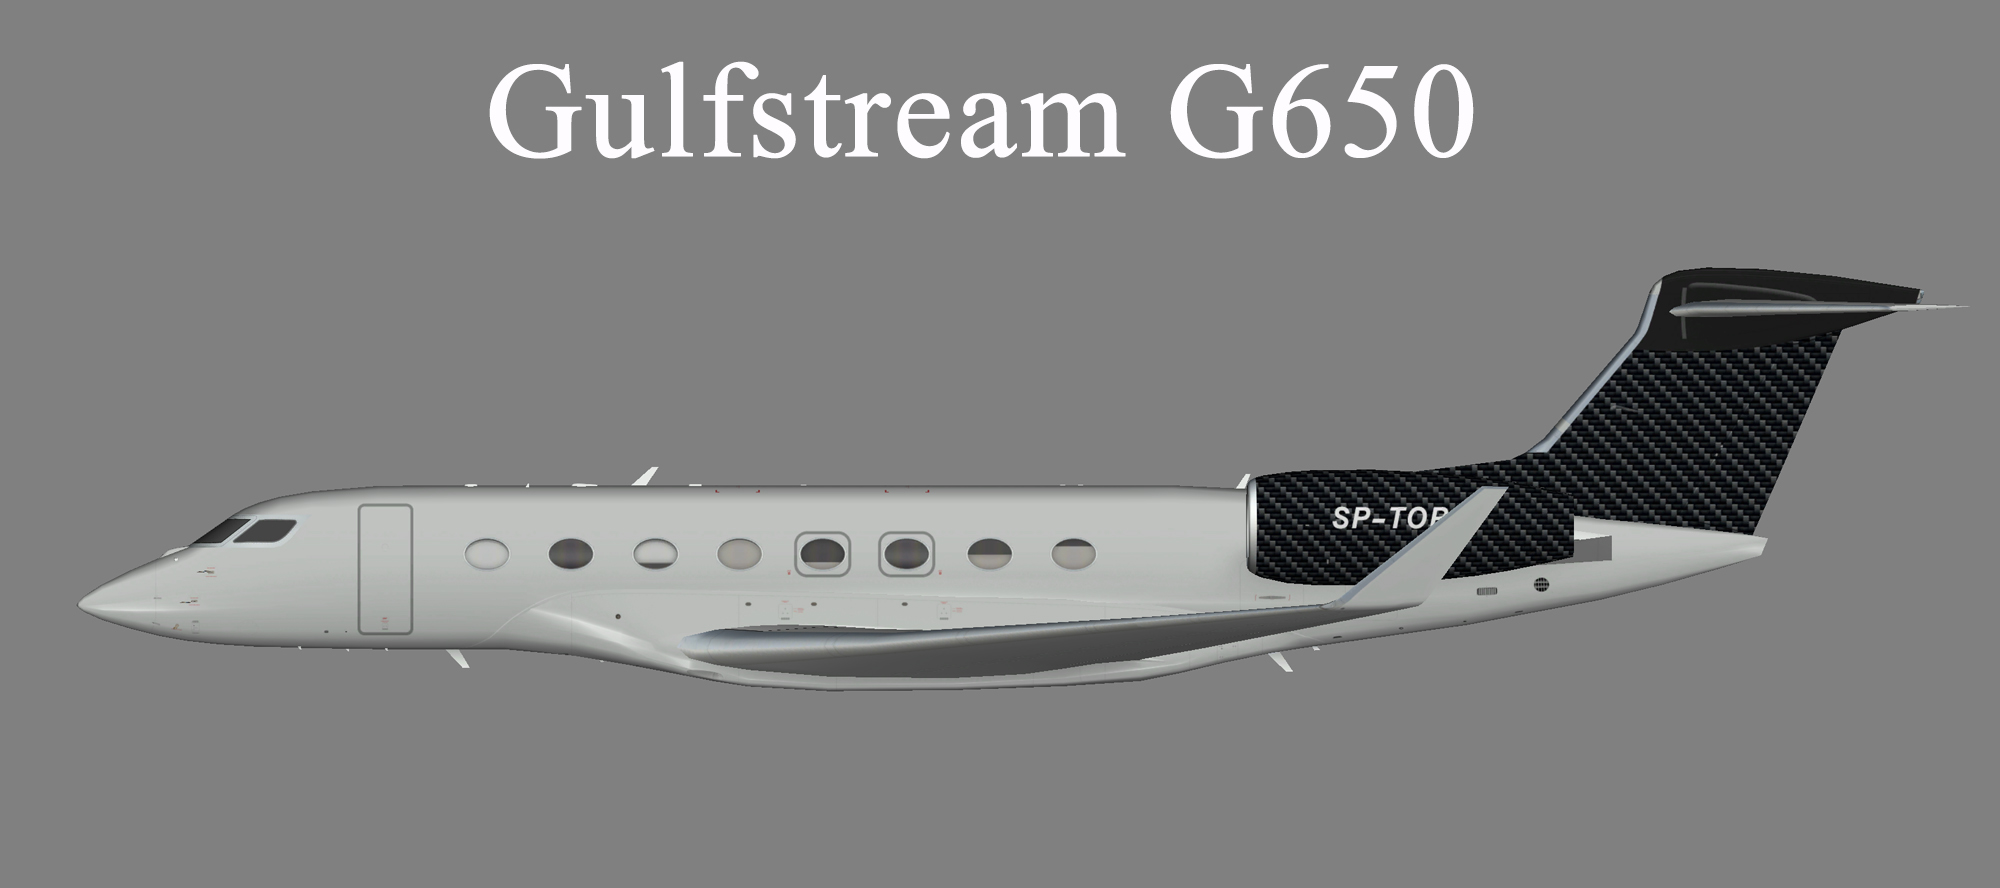 Jet Story Gulfstream G650 (SP-TOP)